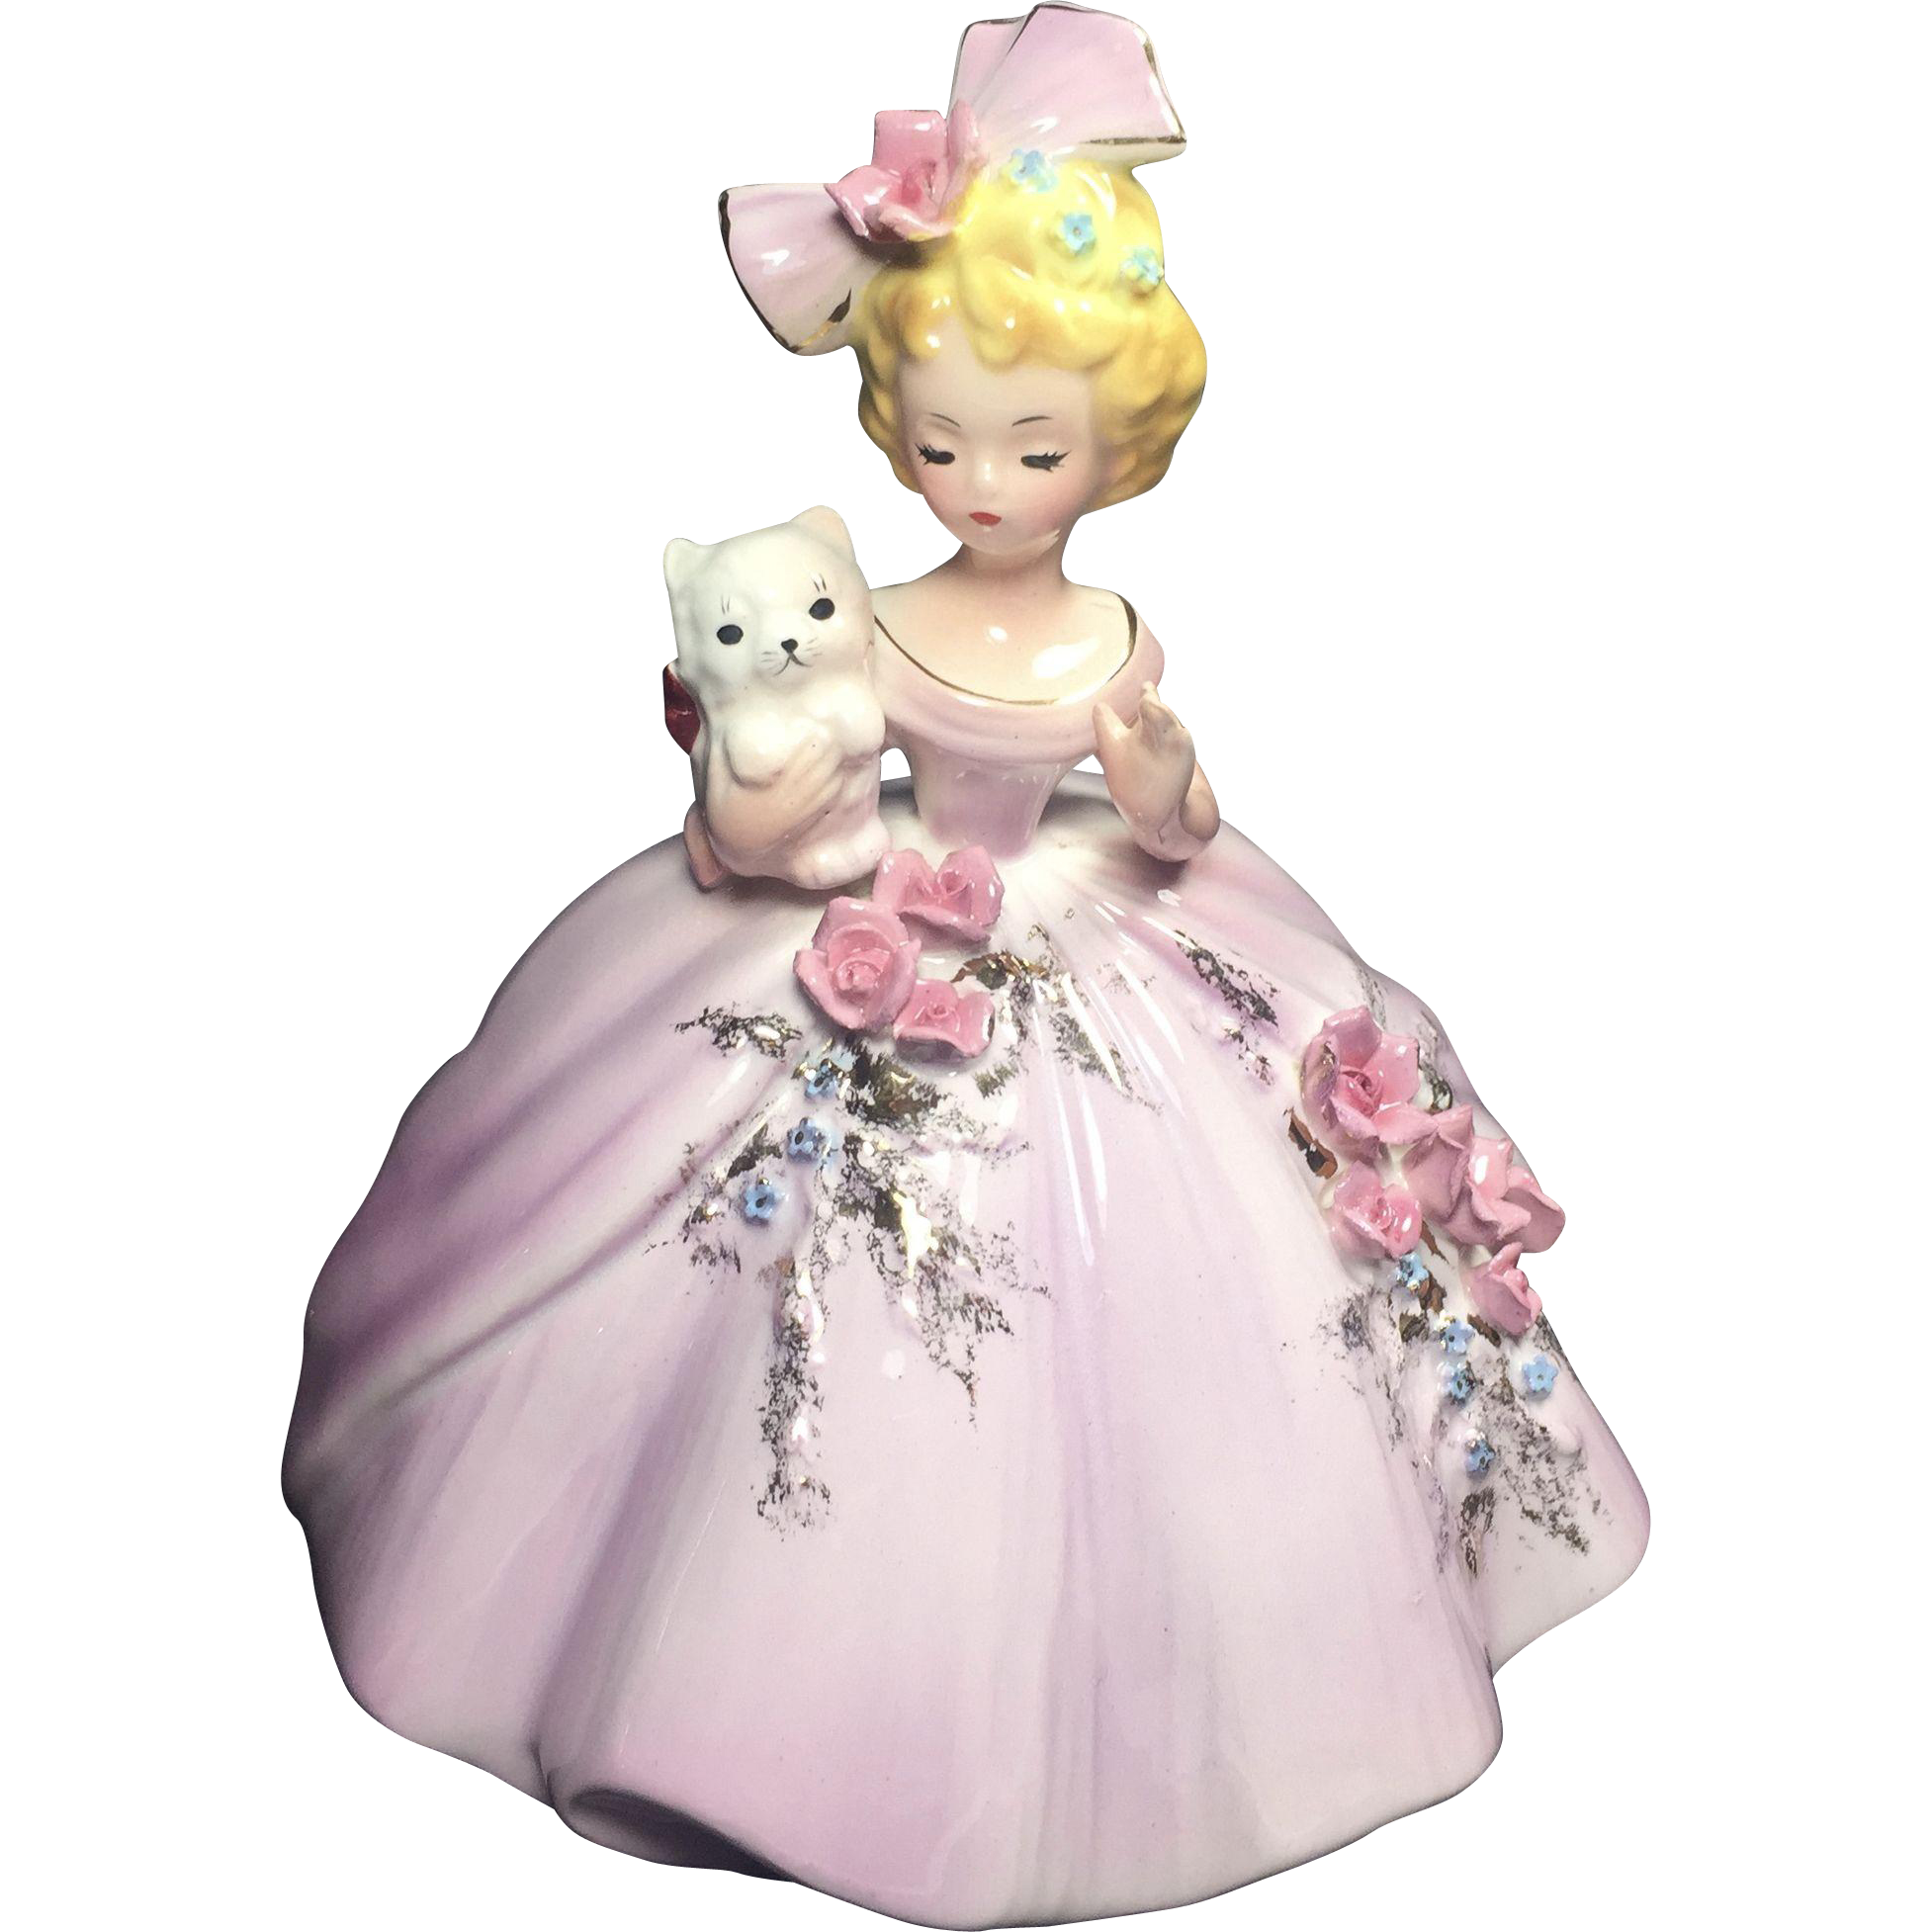 Vintage Josef Originals Girl Figurine Holding Kitten Big Bow in Hair